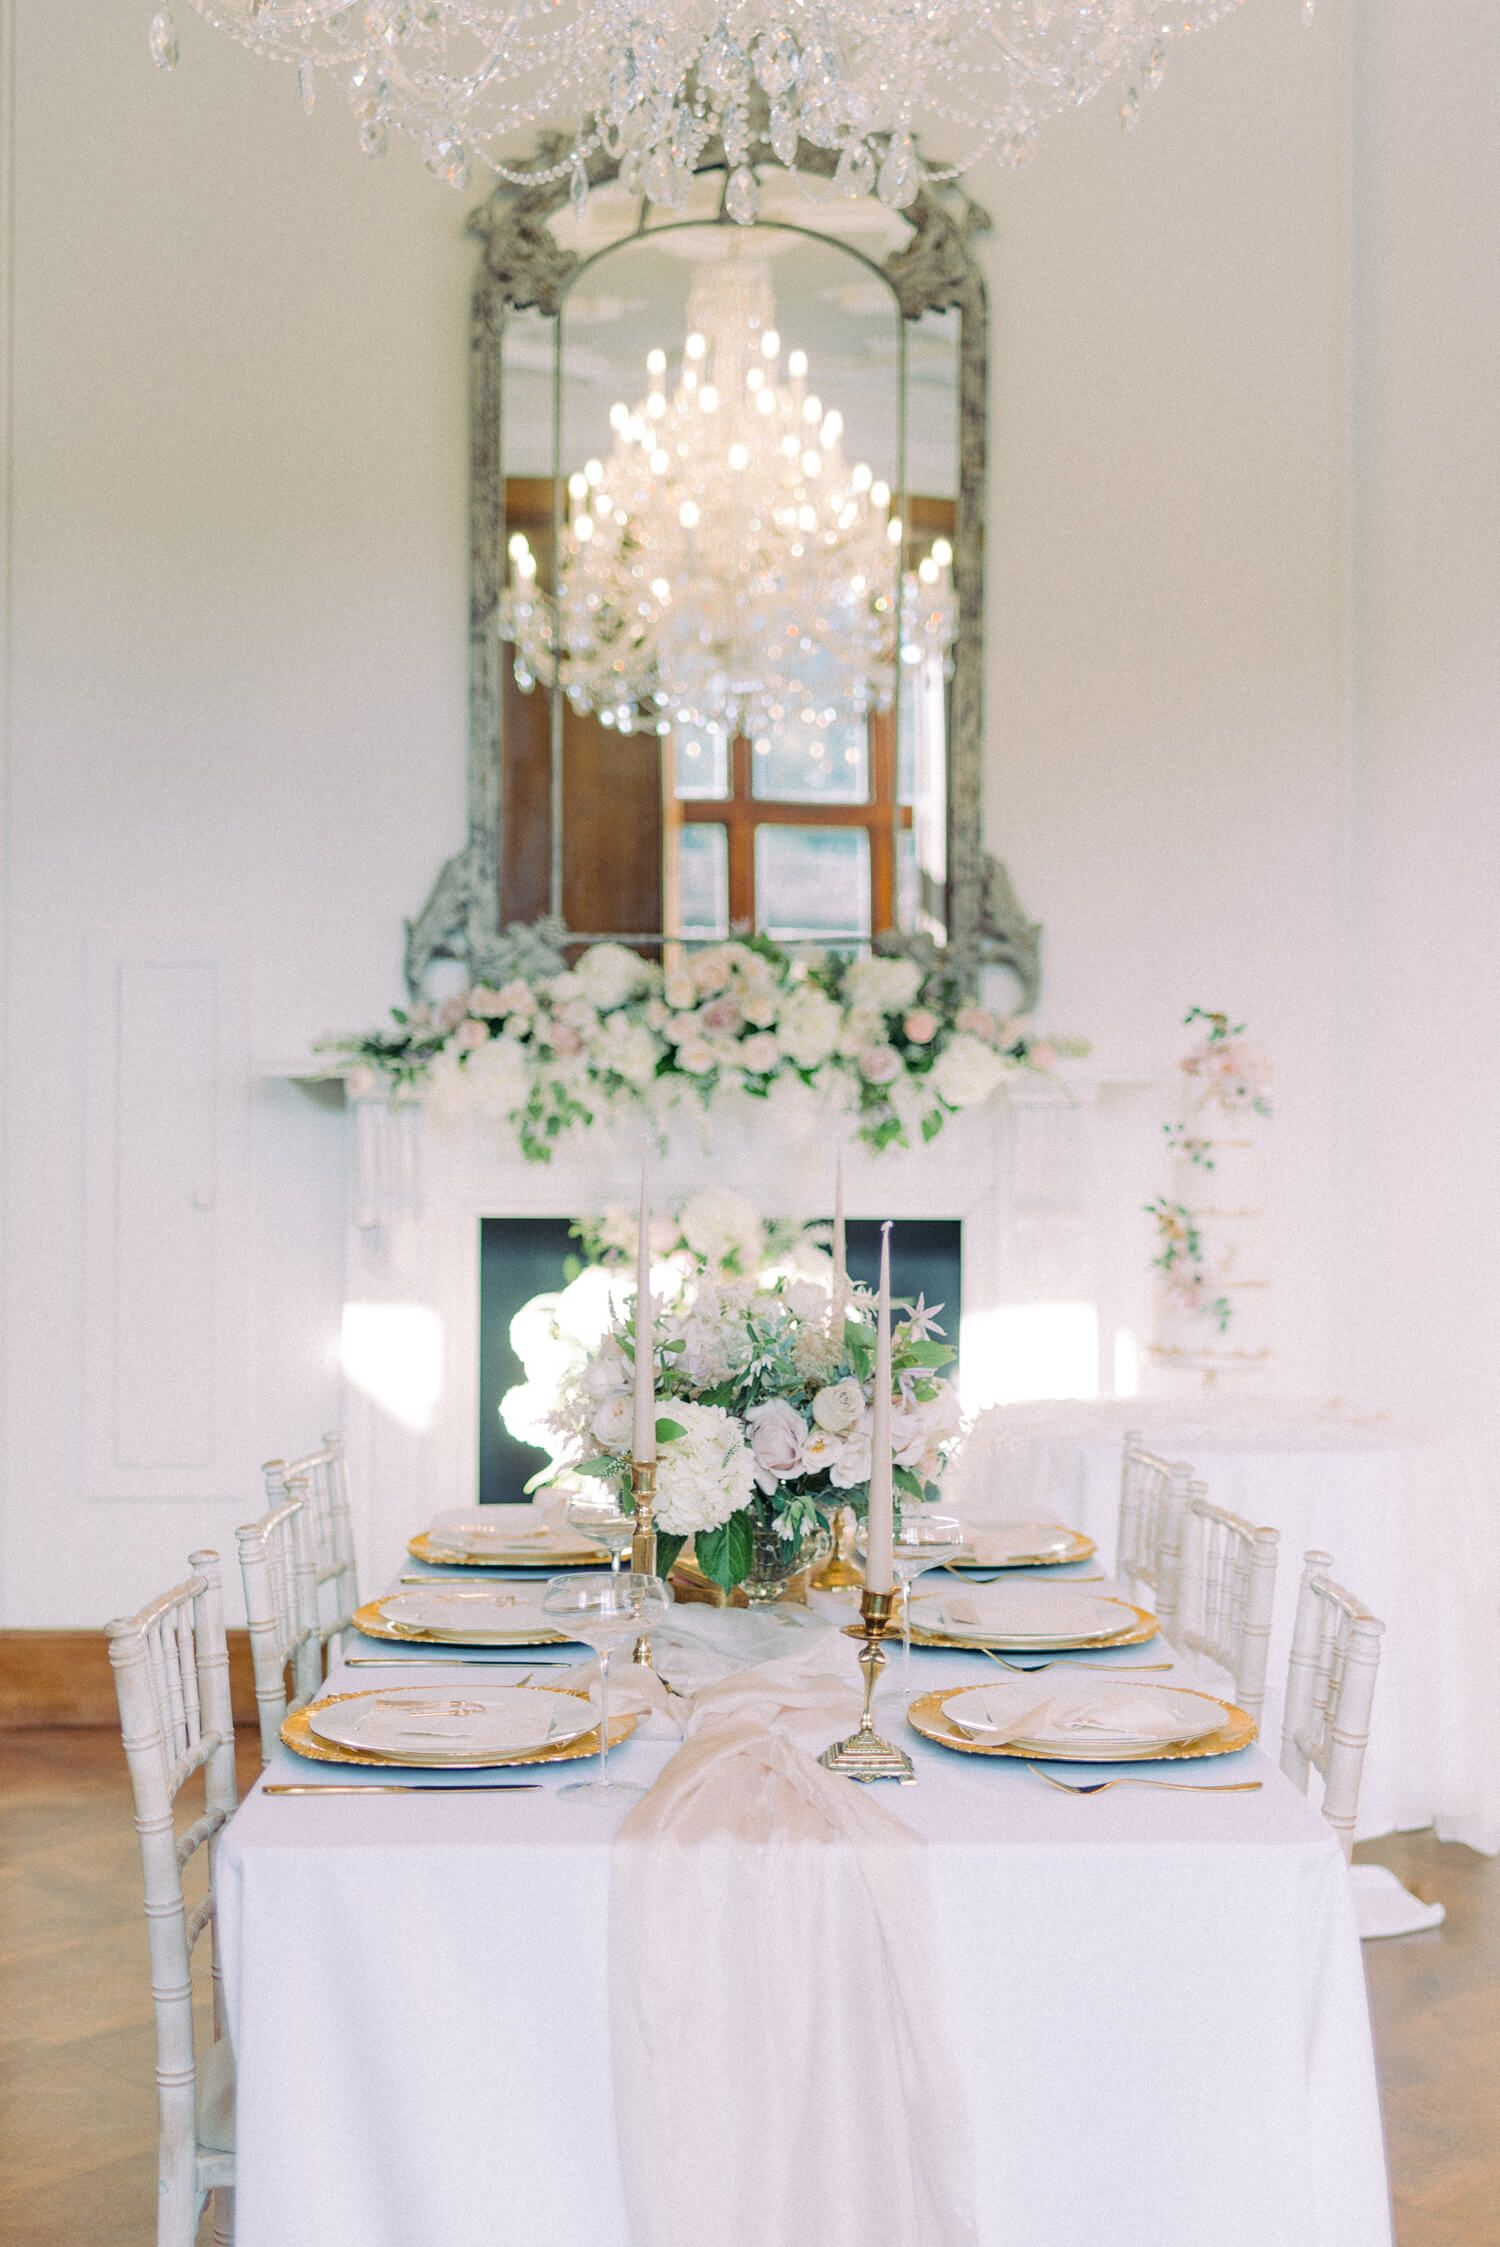 Thicket Priory Venue Guide Cristina Ilao Photography Beautiful Wedding Table Decorations Wedding Venues Uk Wedding Decor Elegant